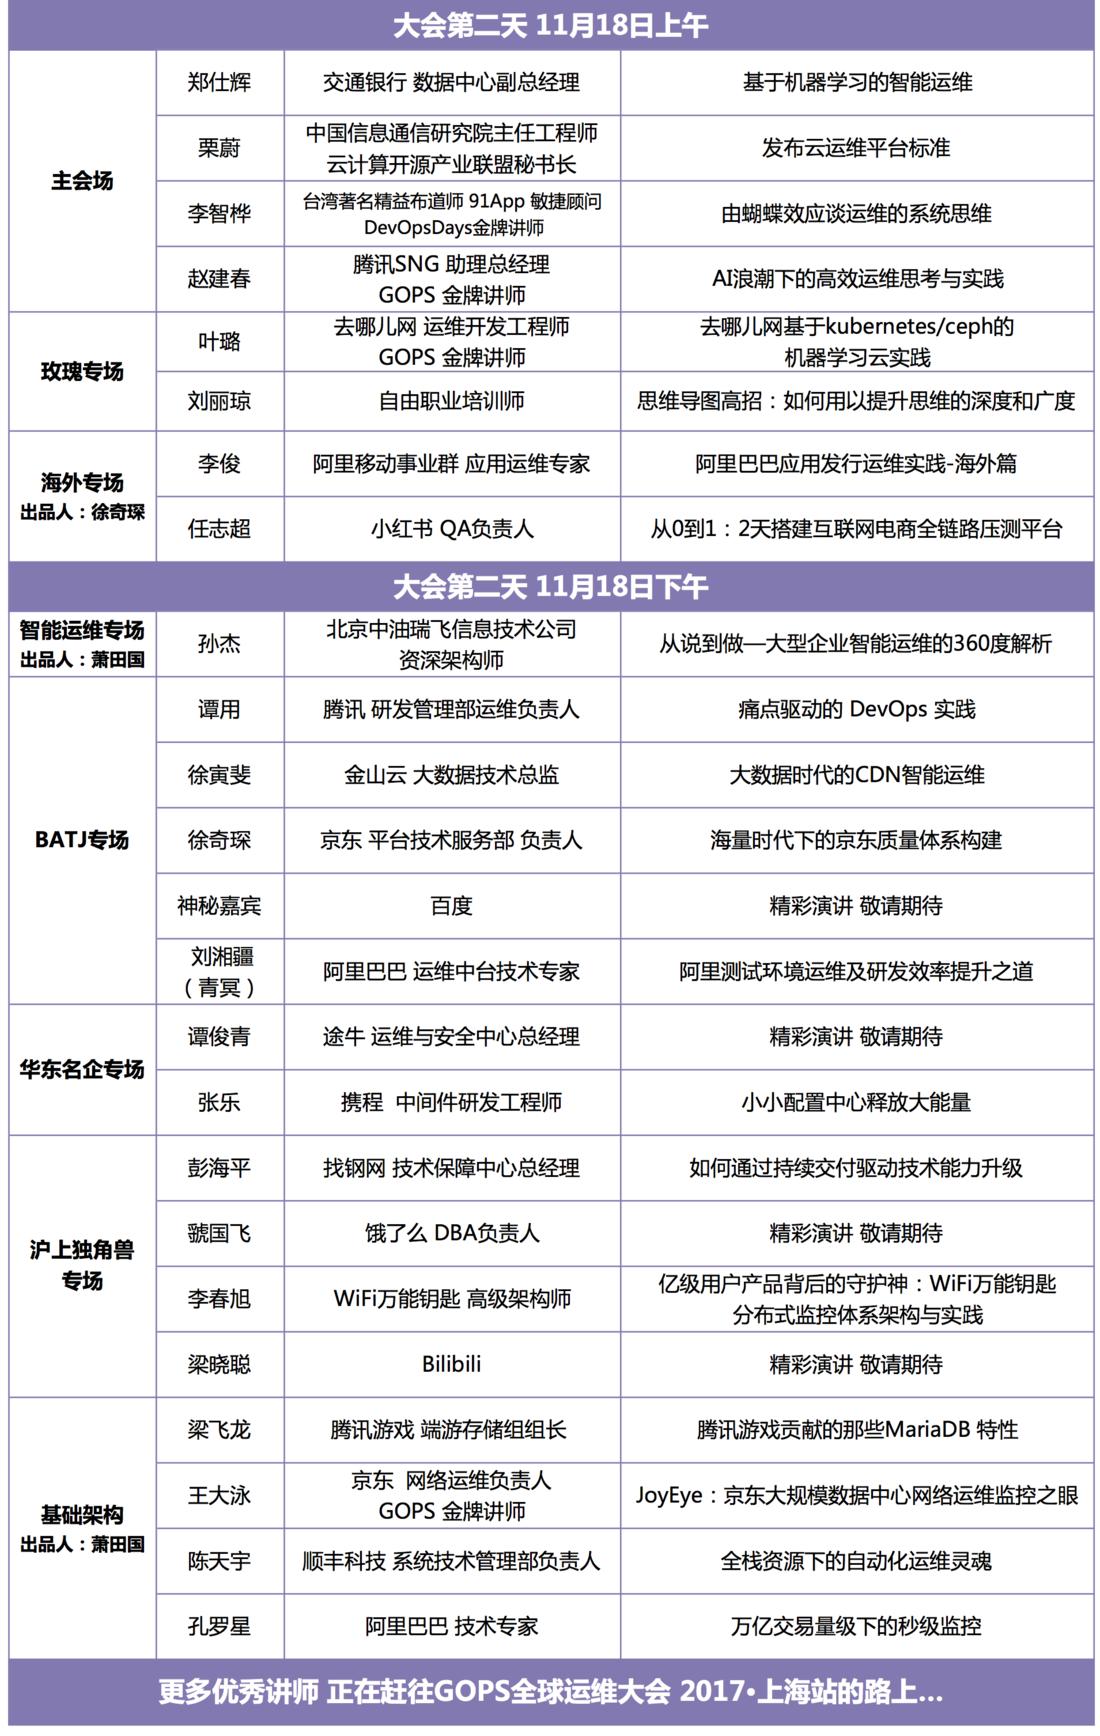 GOPS 2017全球运维大会上海站